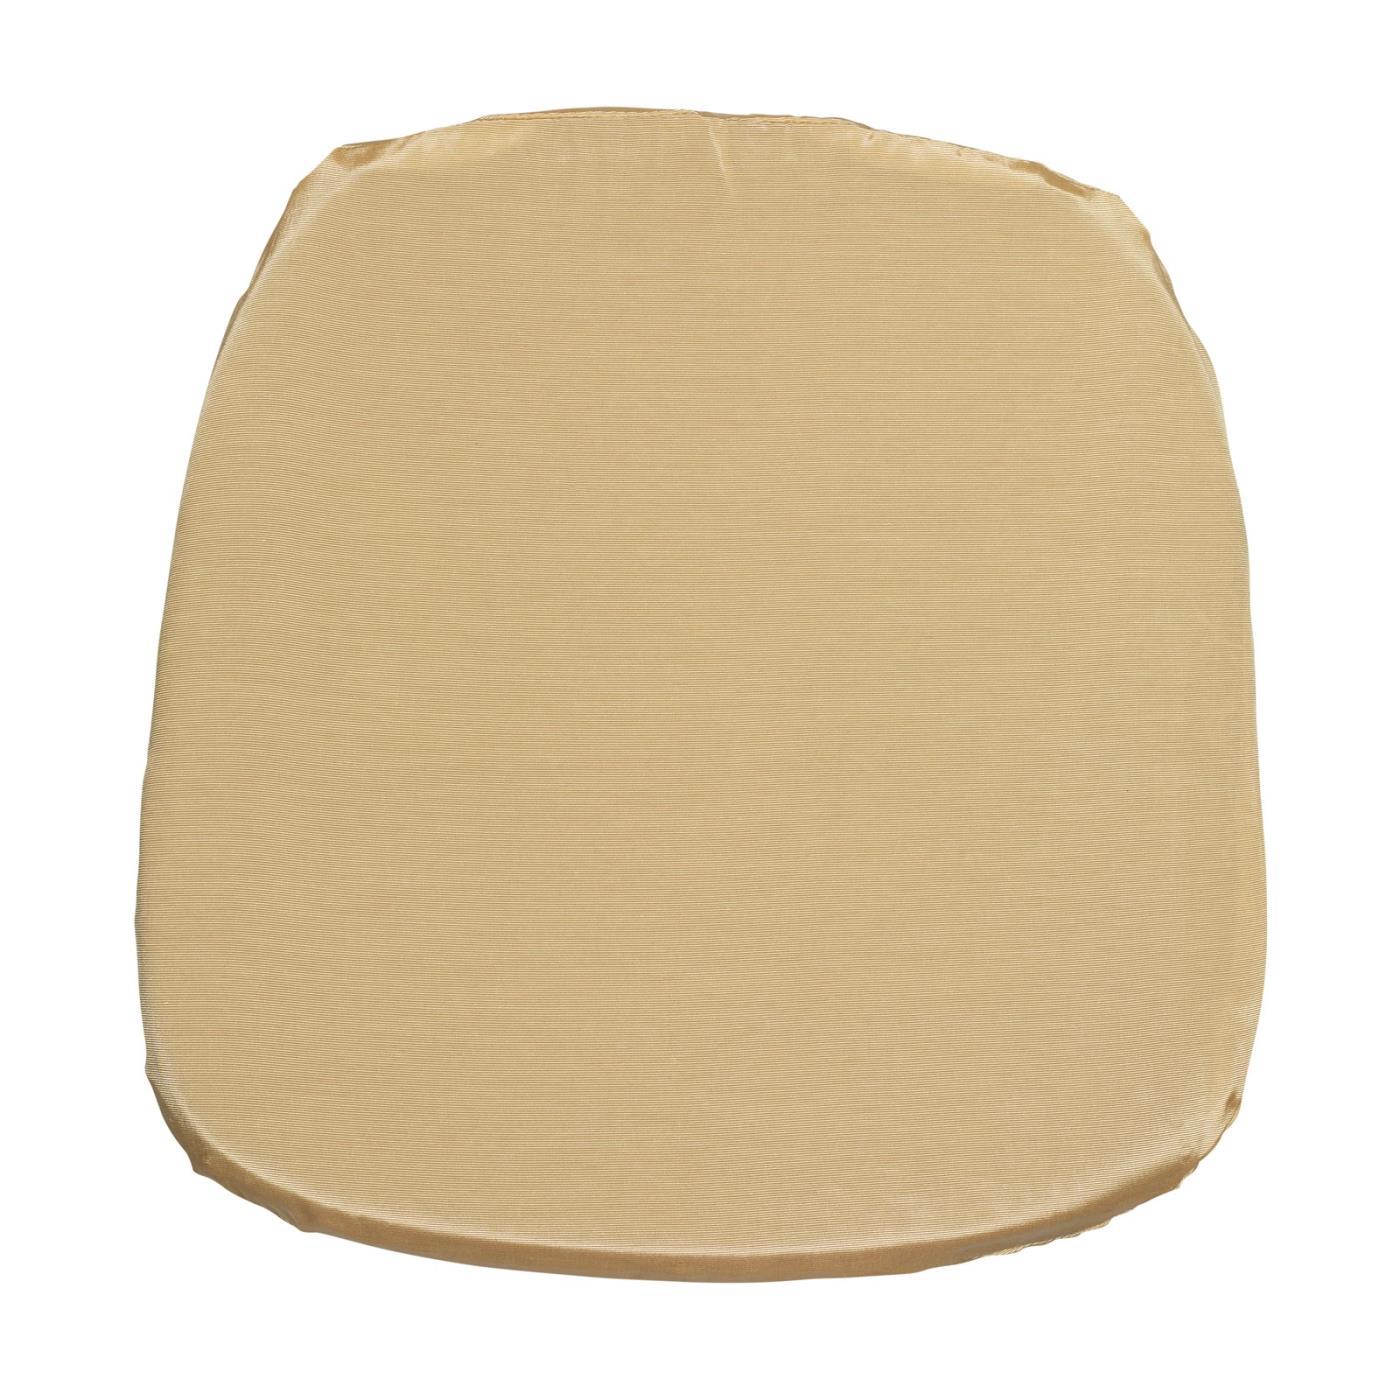 Bengaline Seat Cushion - Deauville Sand